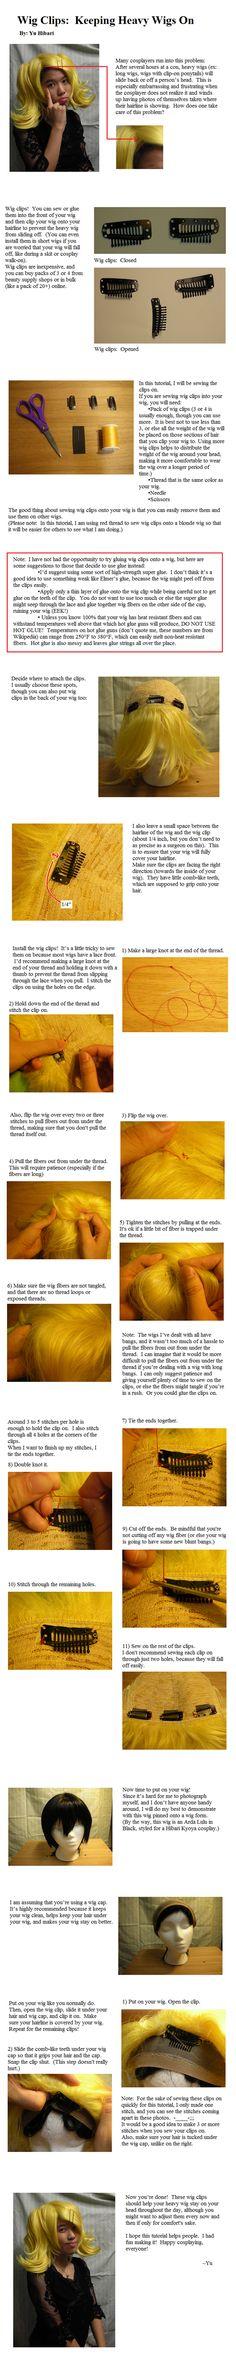 Wig Clips: Keeping Heavy Wigs On | Arda Wigs